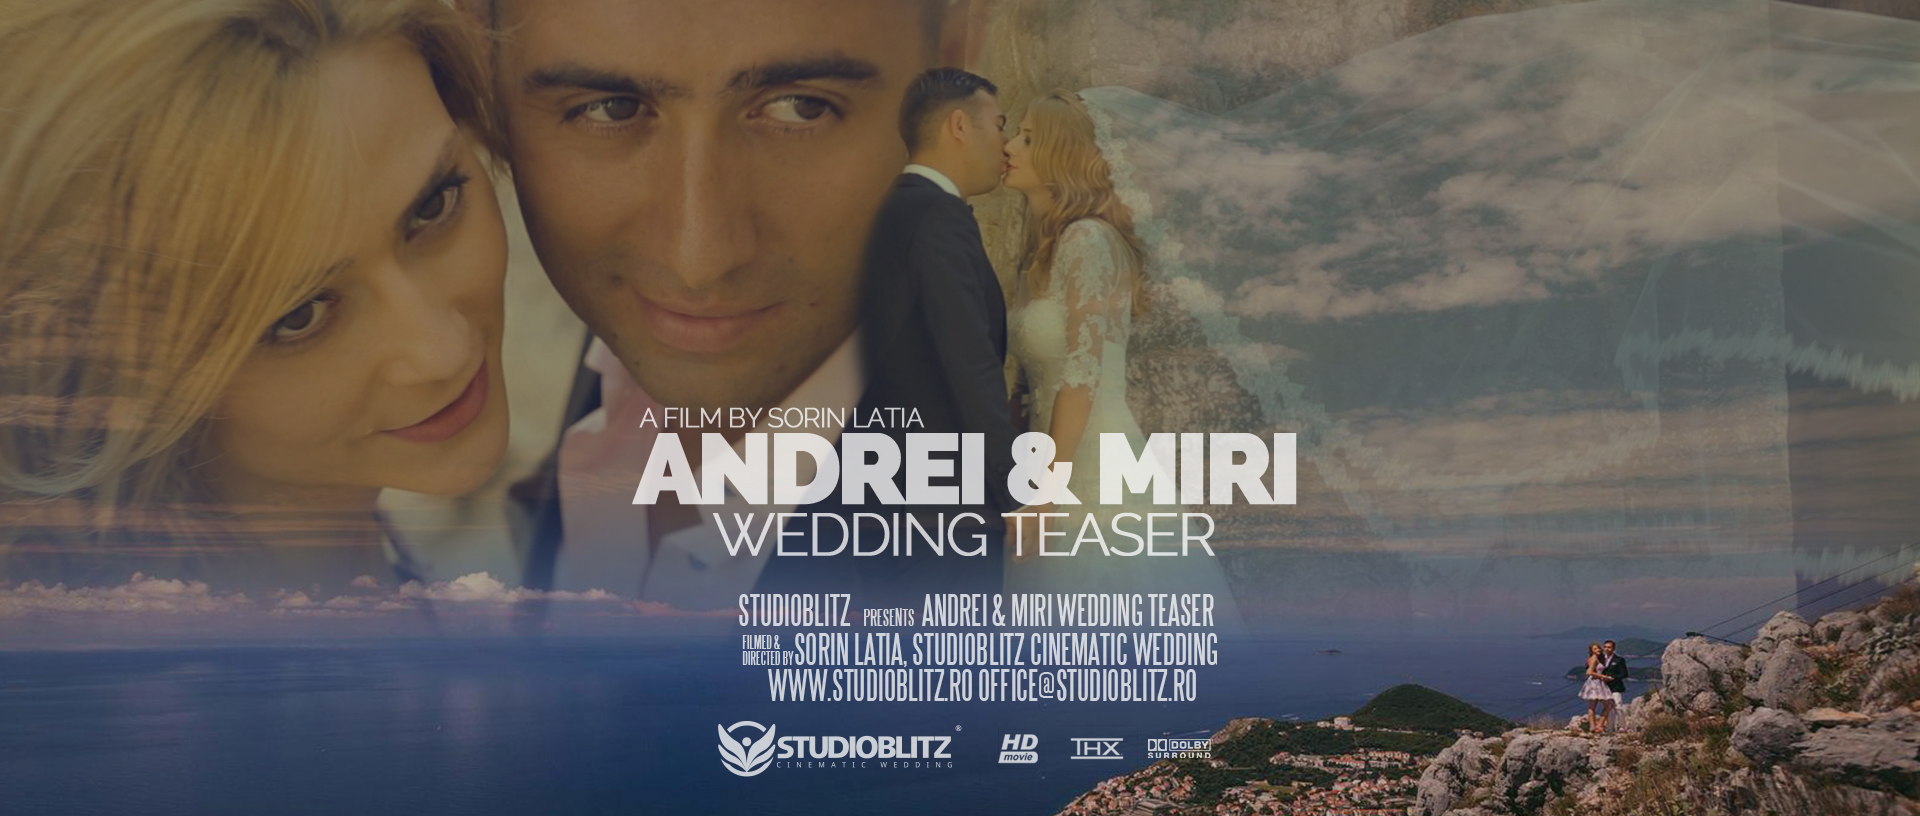 Filmari nunti profesionale